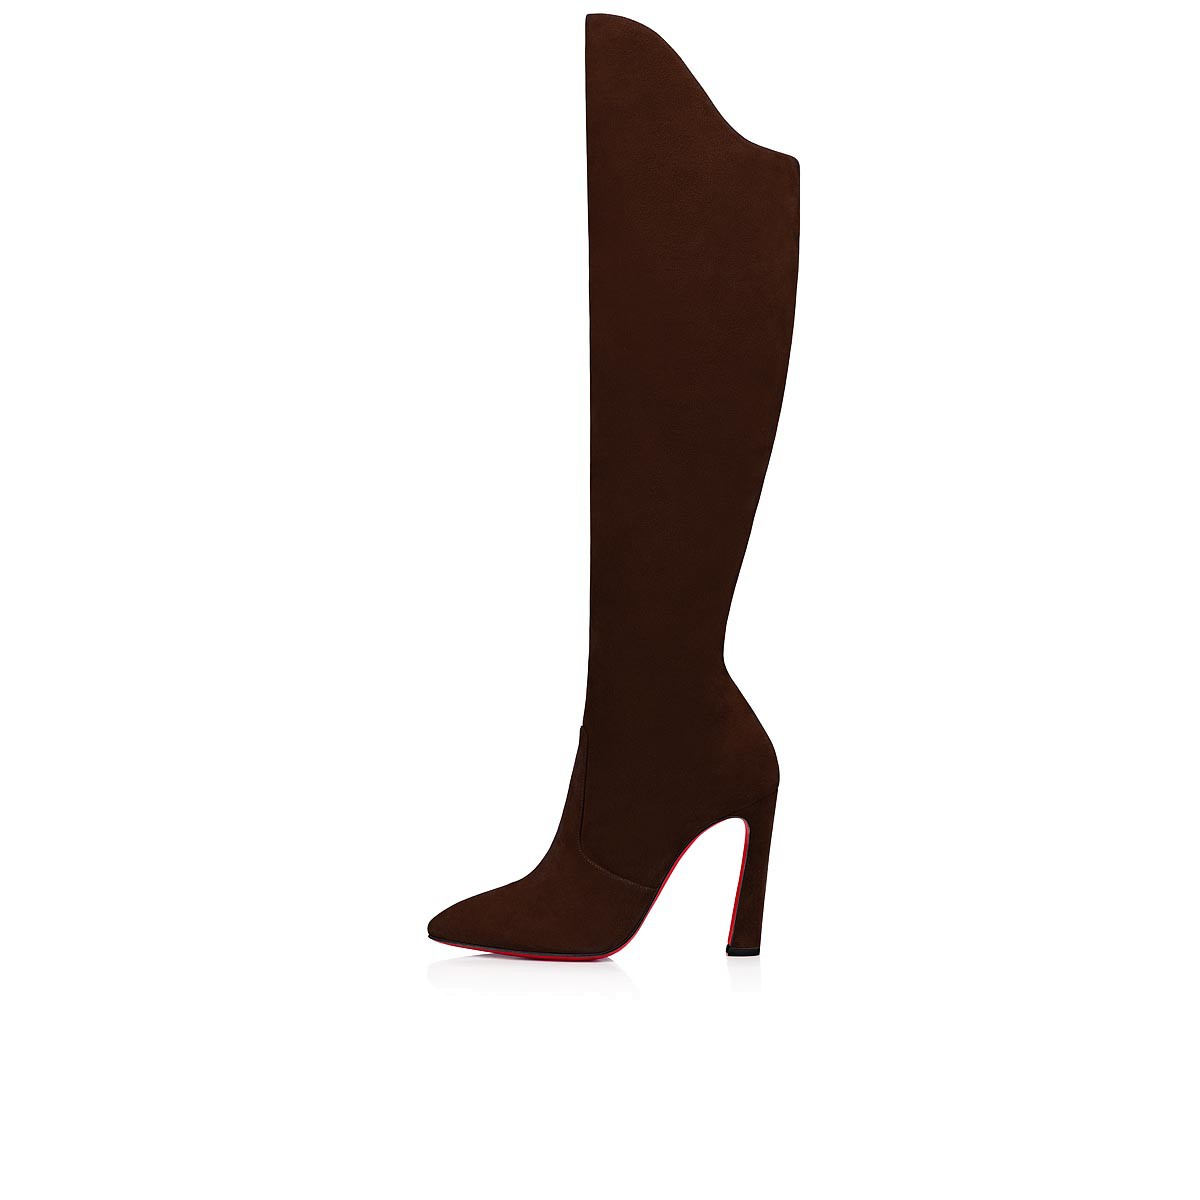 Shoes - Eleonor Botta - Christian Louboutin